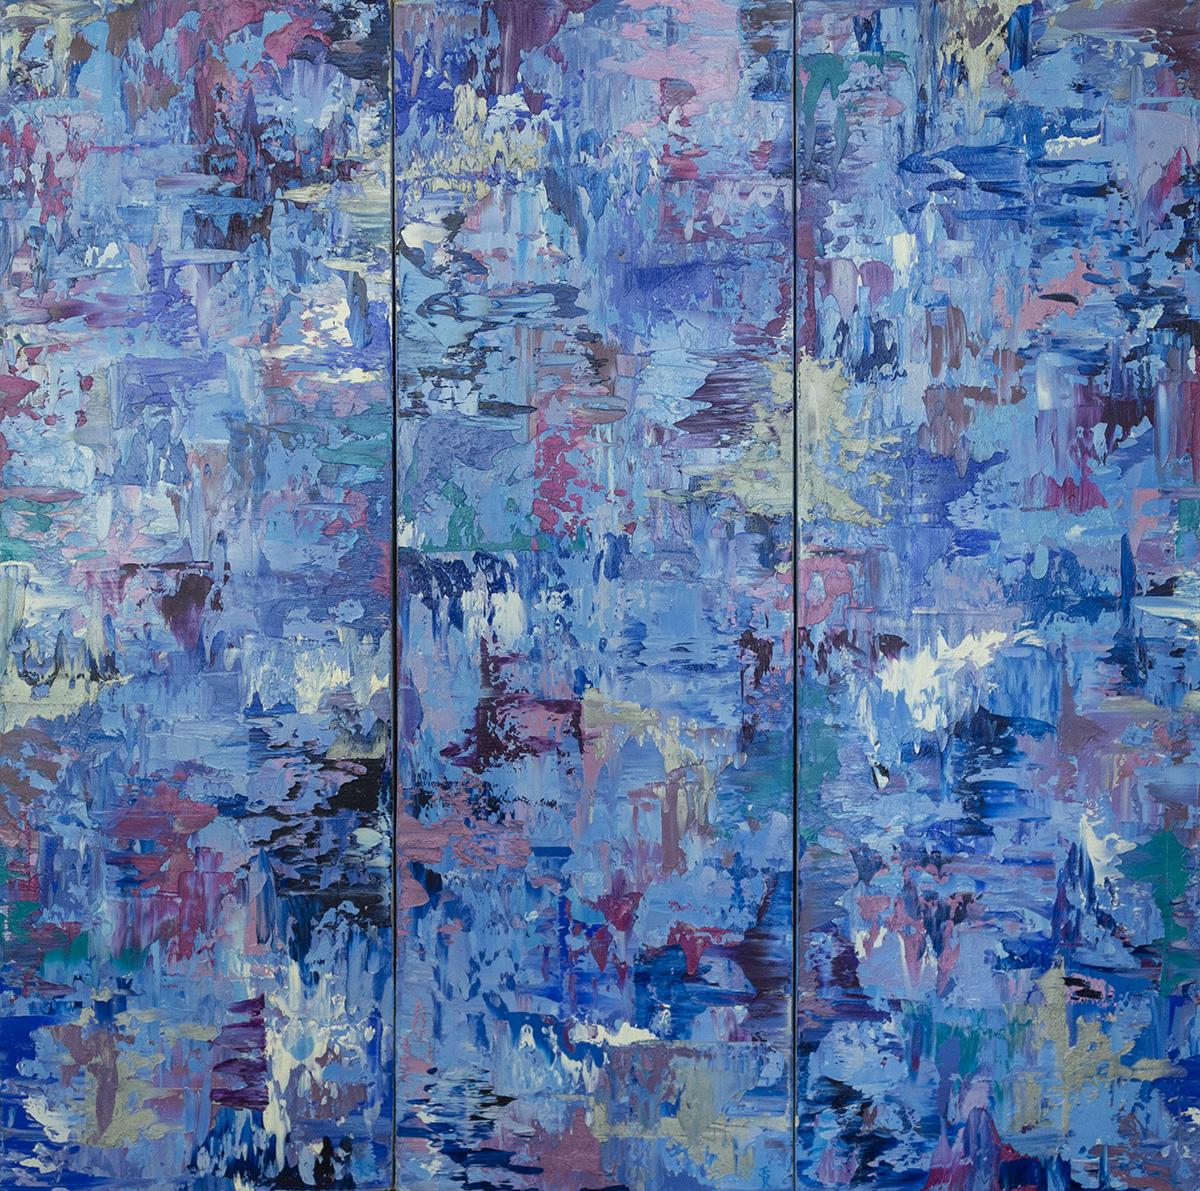 Blue Dream, 2011